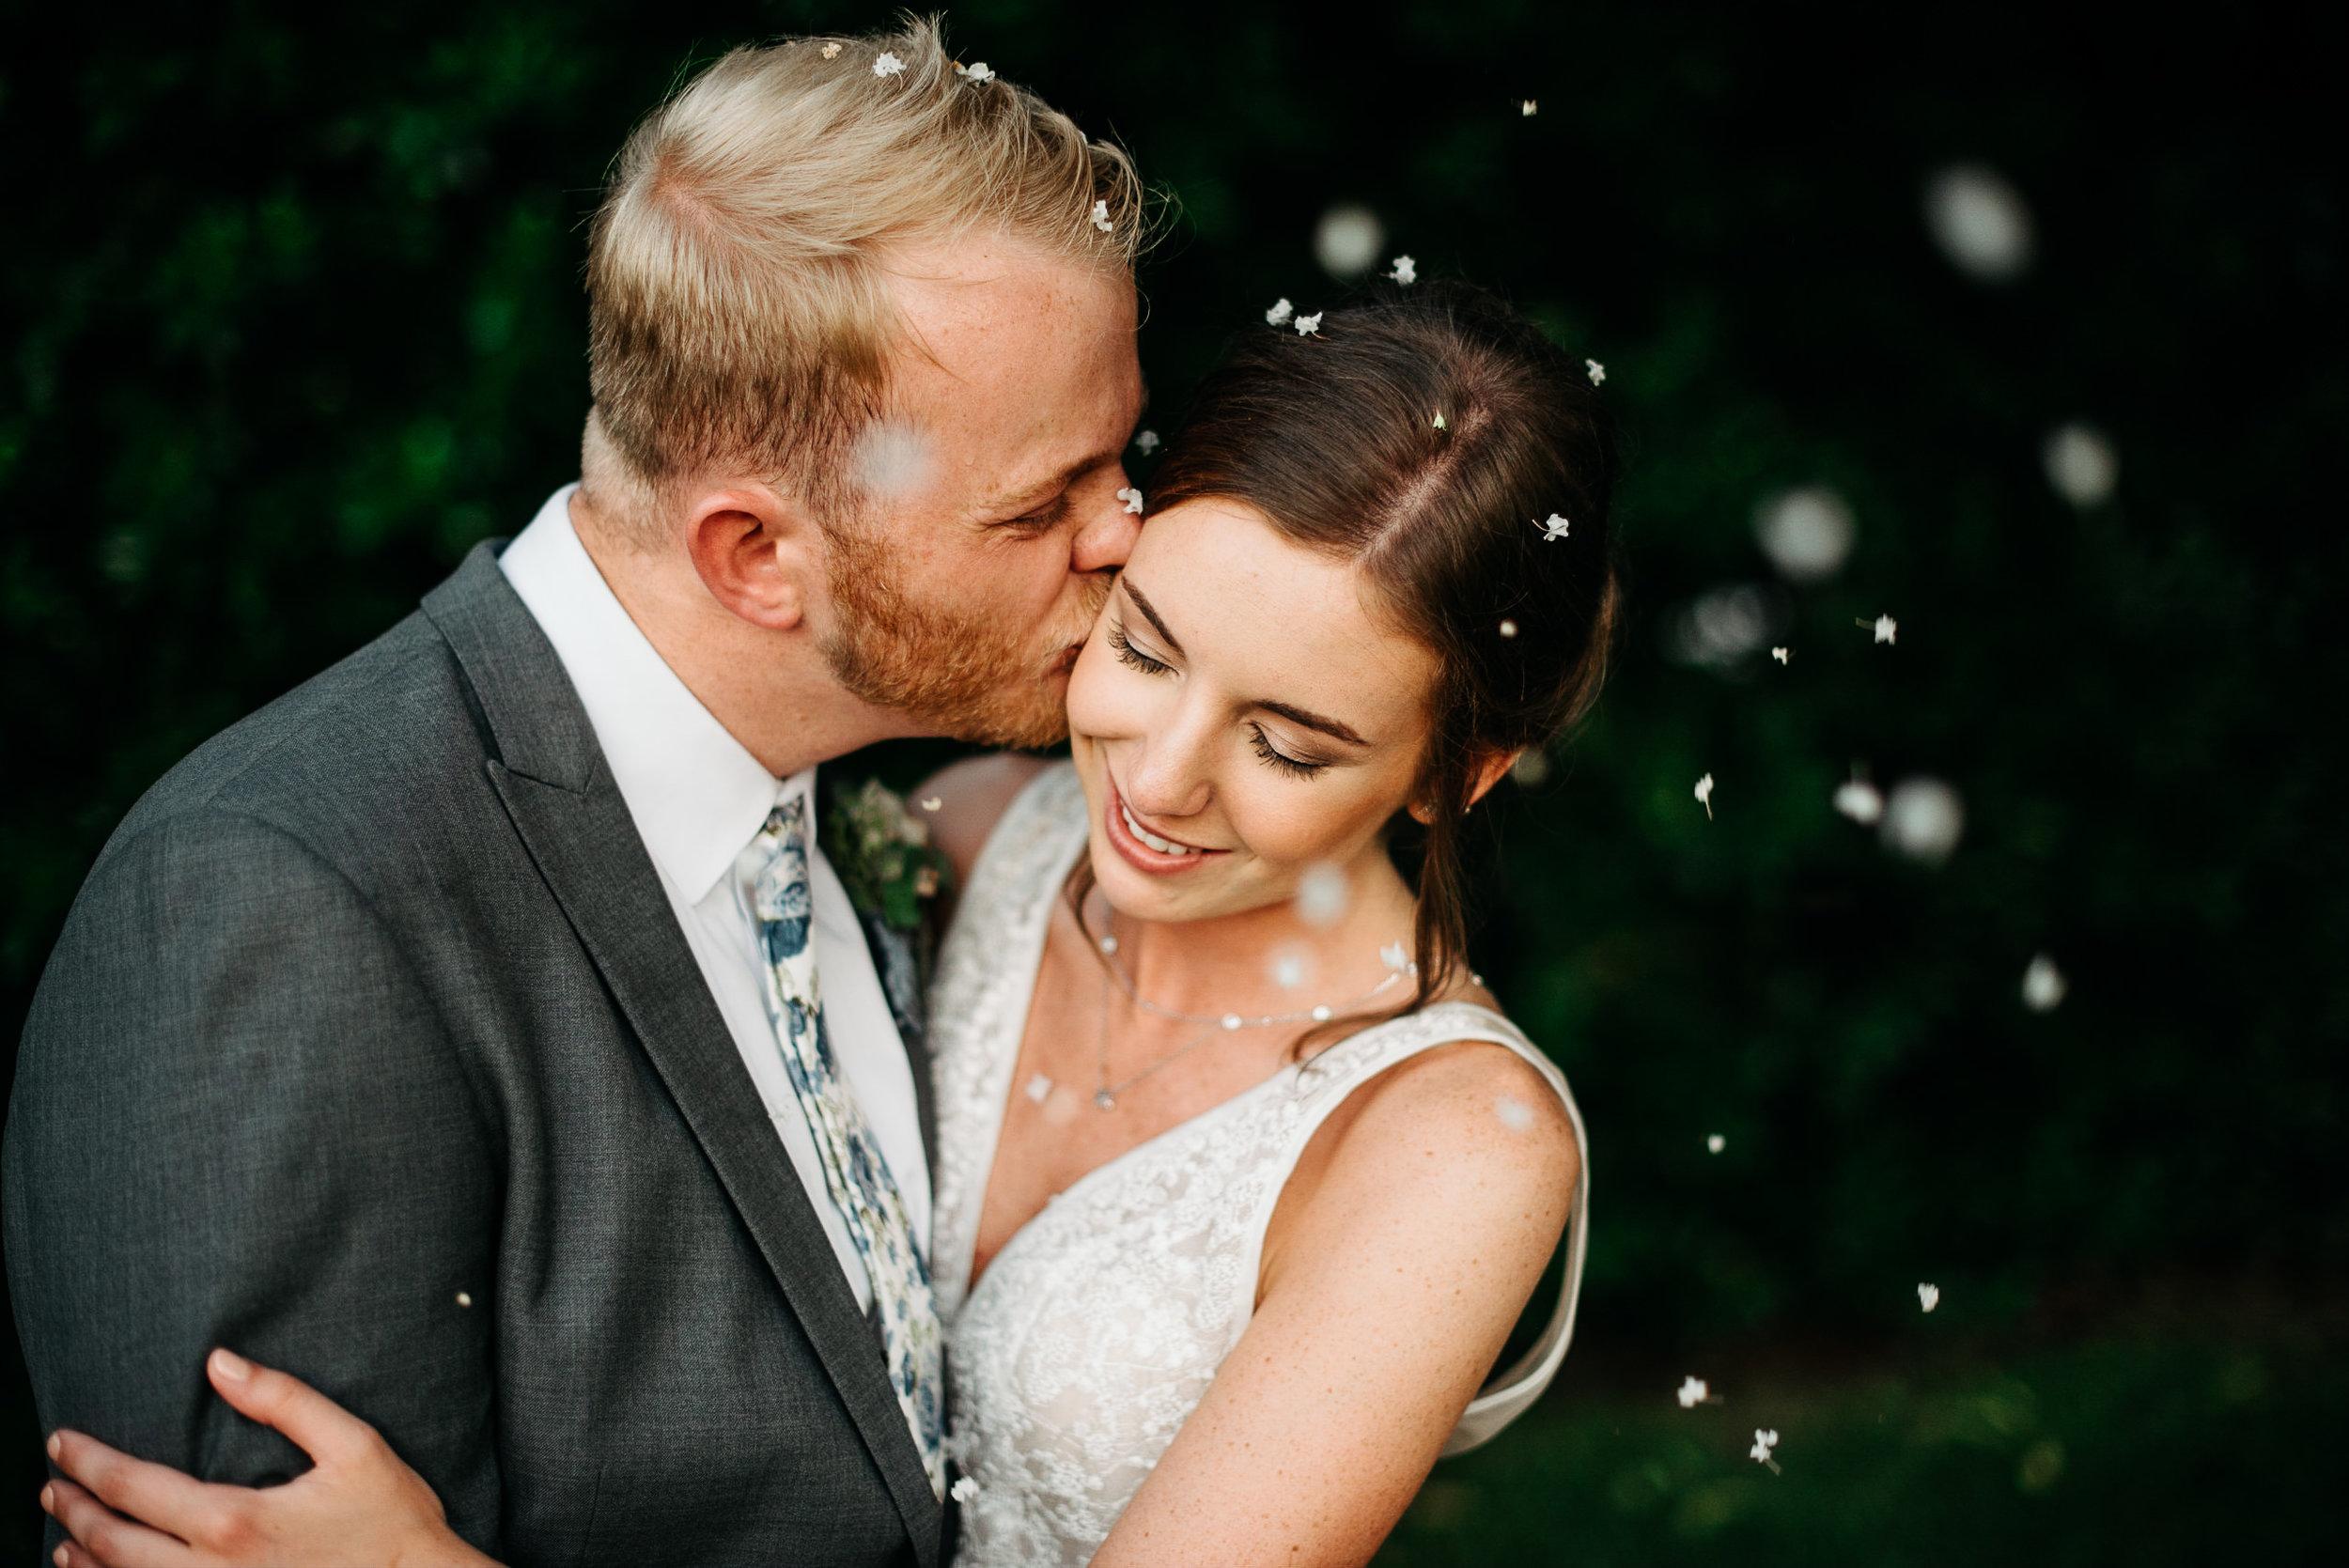 okc-wedding-photographer-coles-garden-wedding-okc-best-wedding-photographers-153.jpg